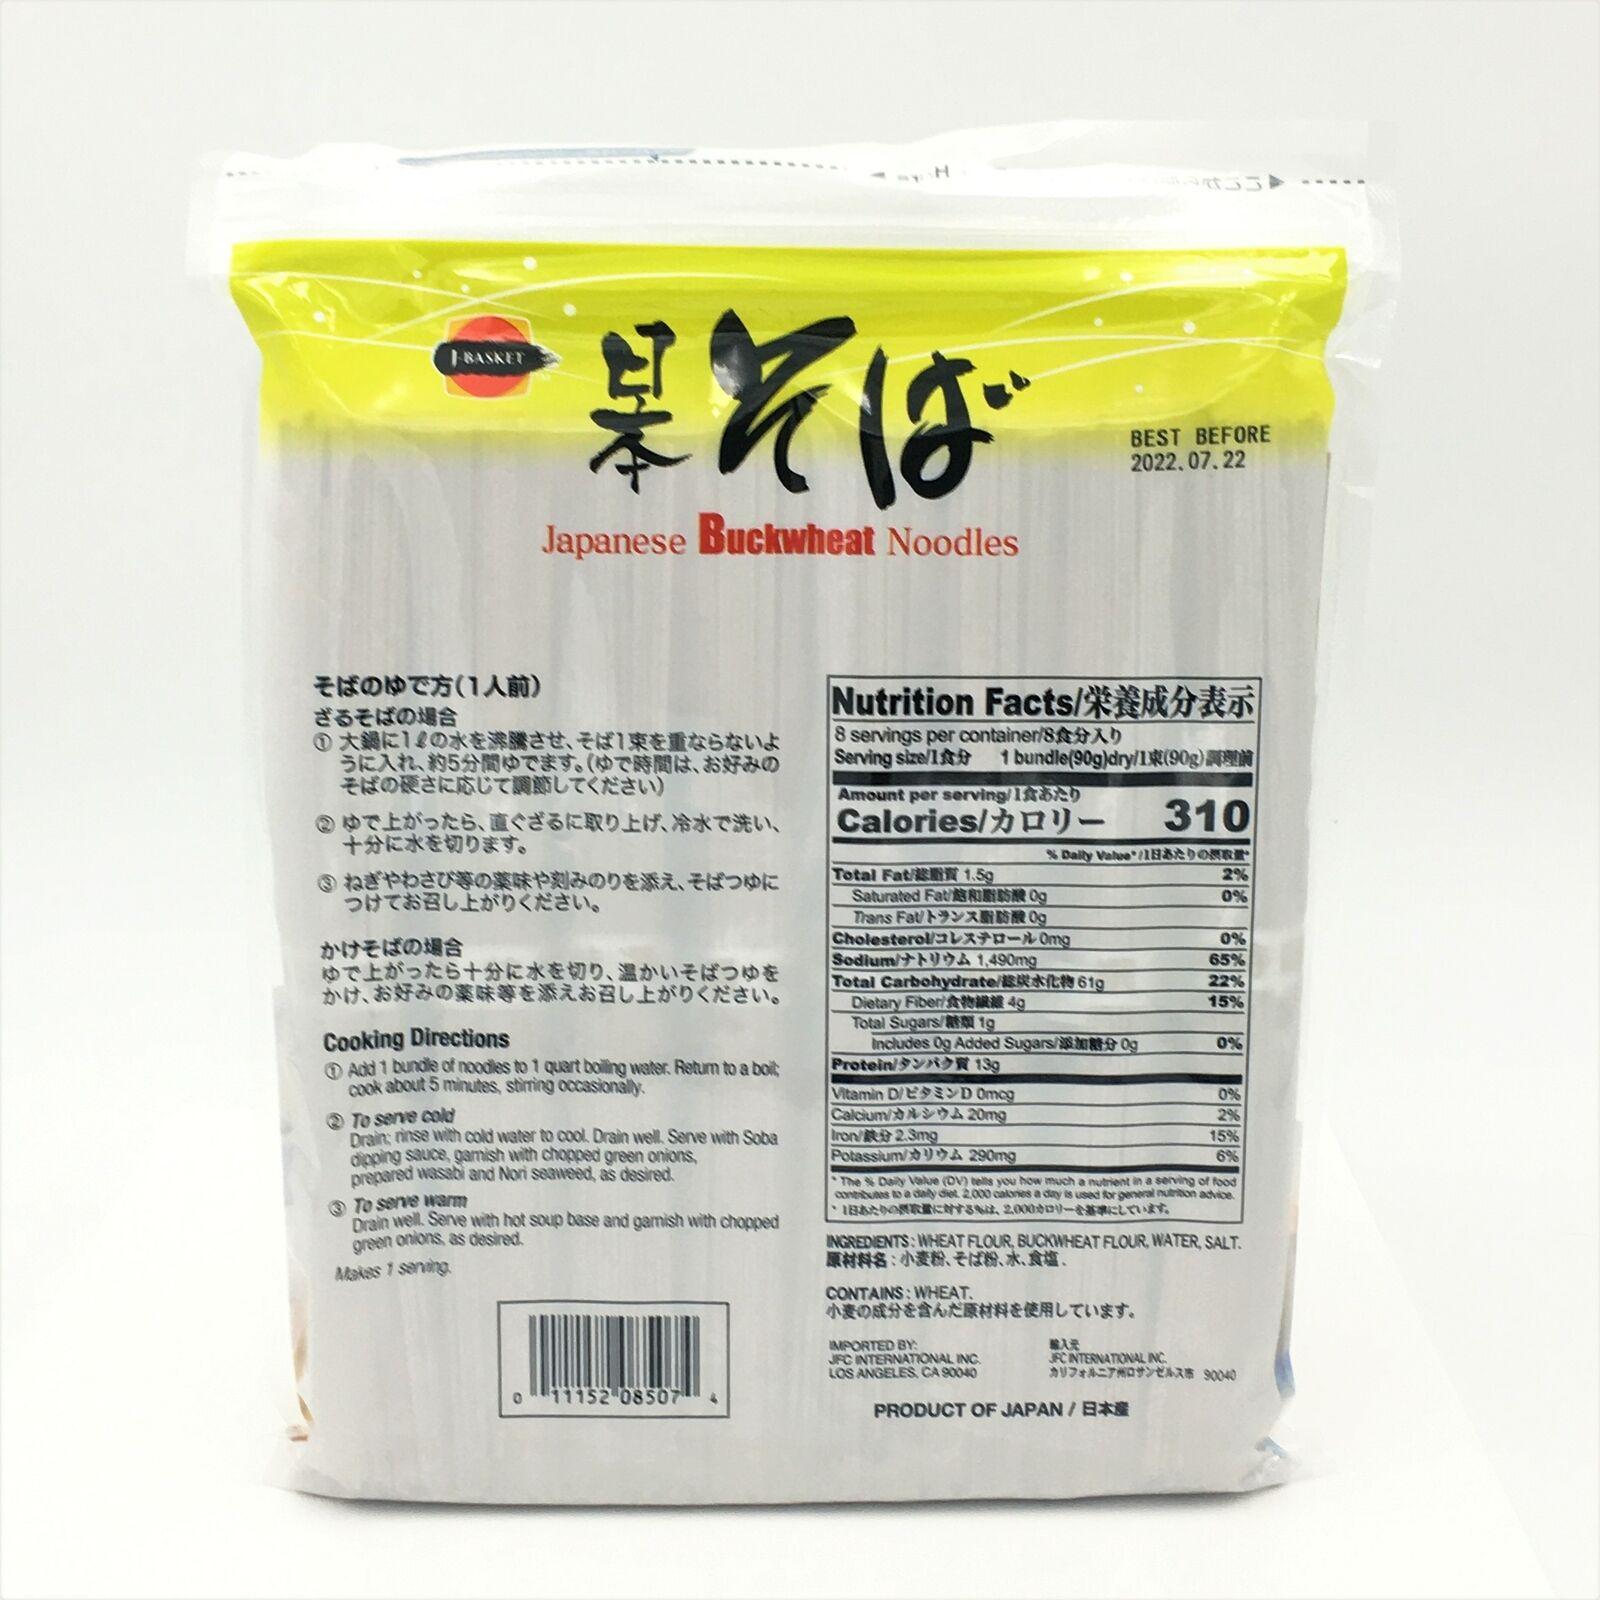 J-BASKET Japanese Buckwheat Noodles 25.40 OZ